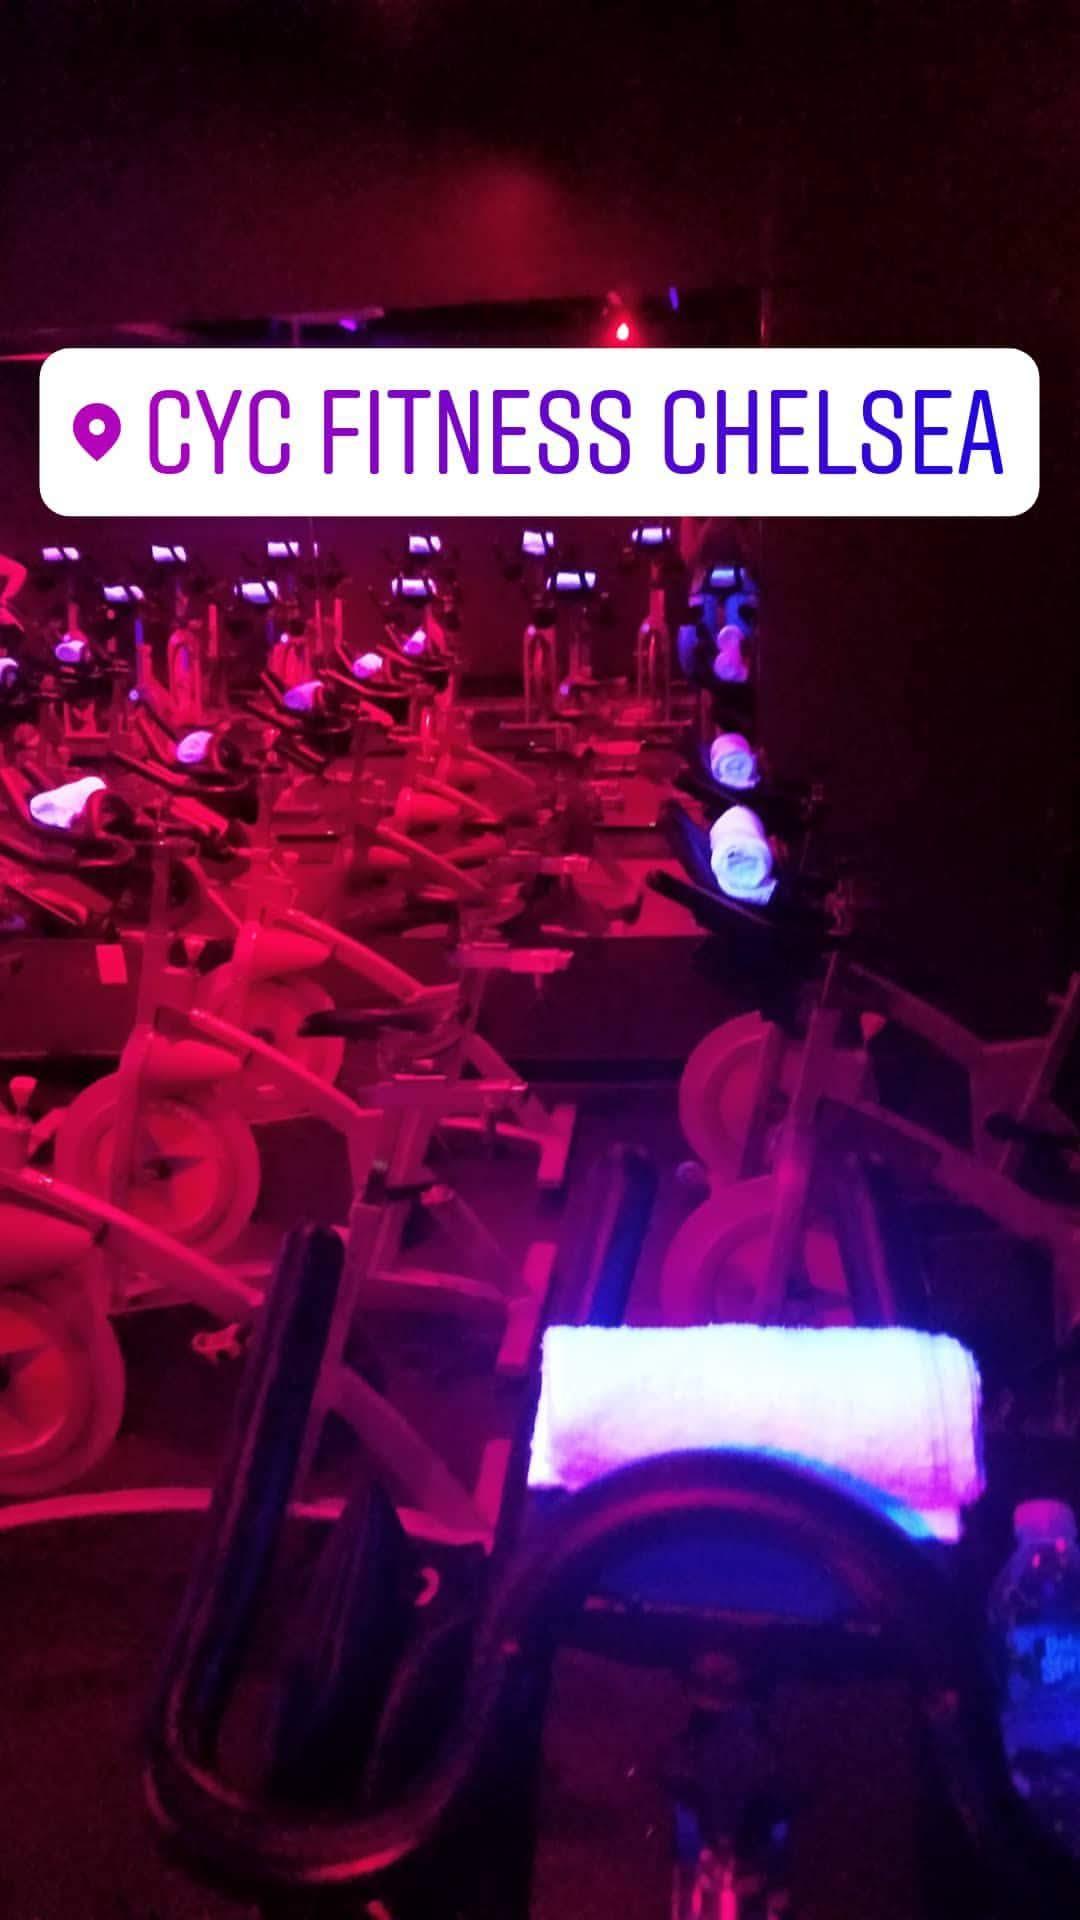 Cyc Fitness Chelsea.jpg